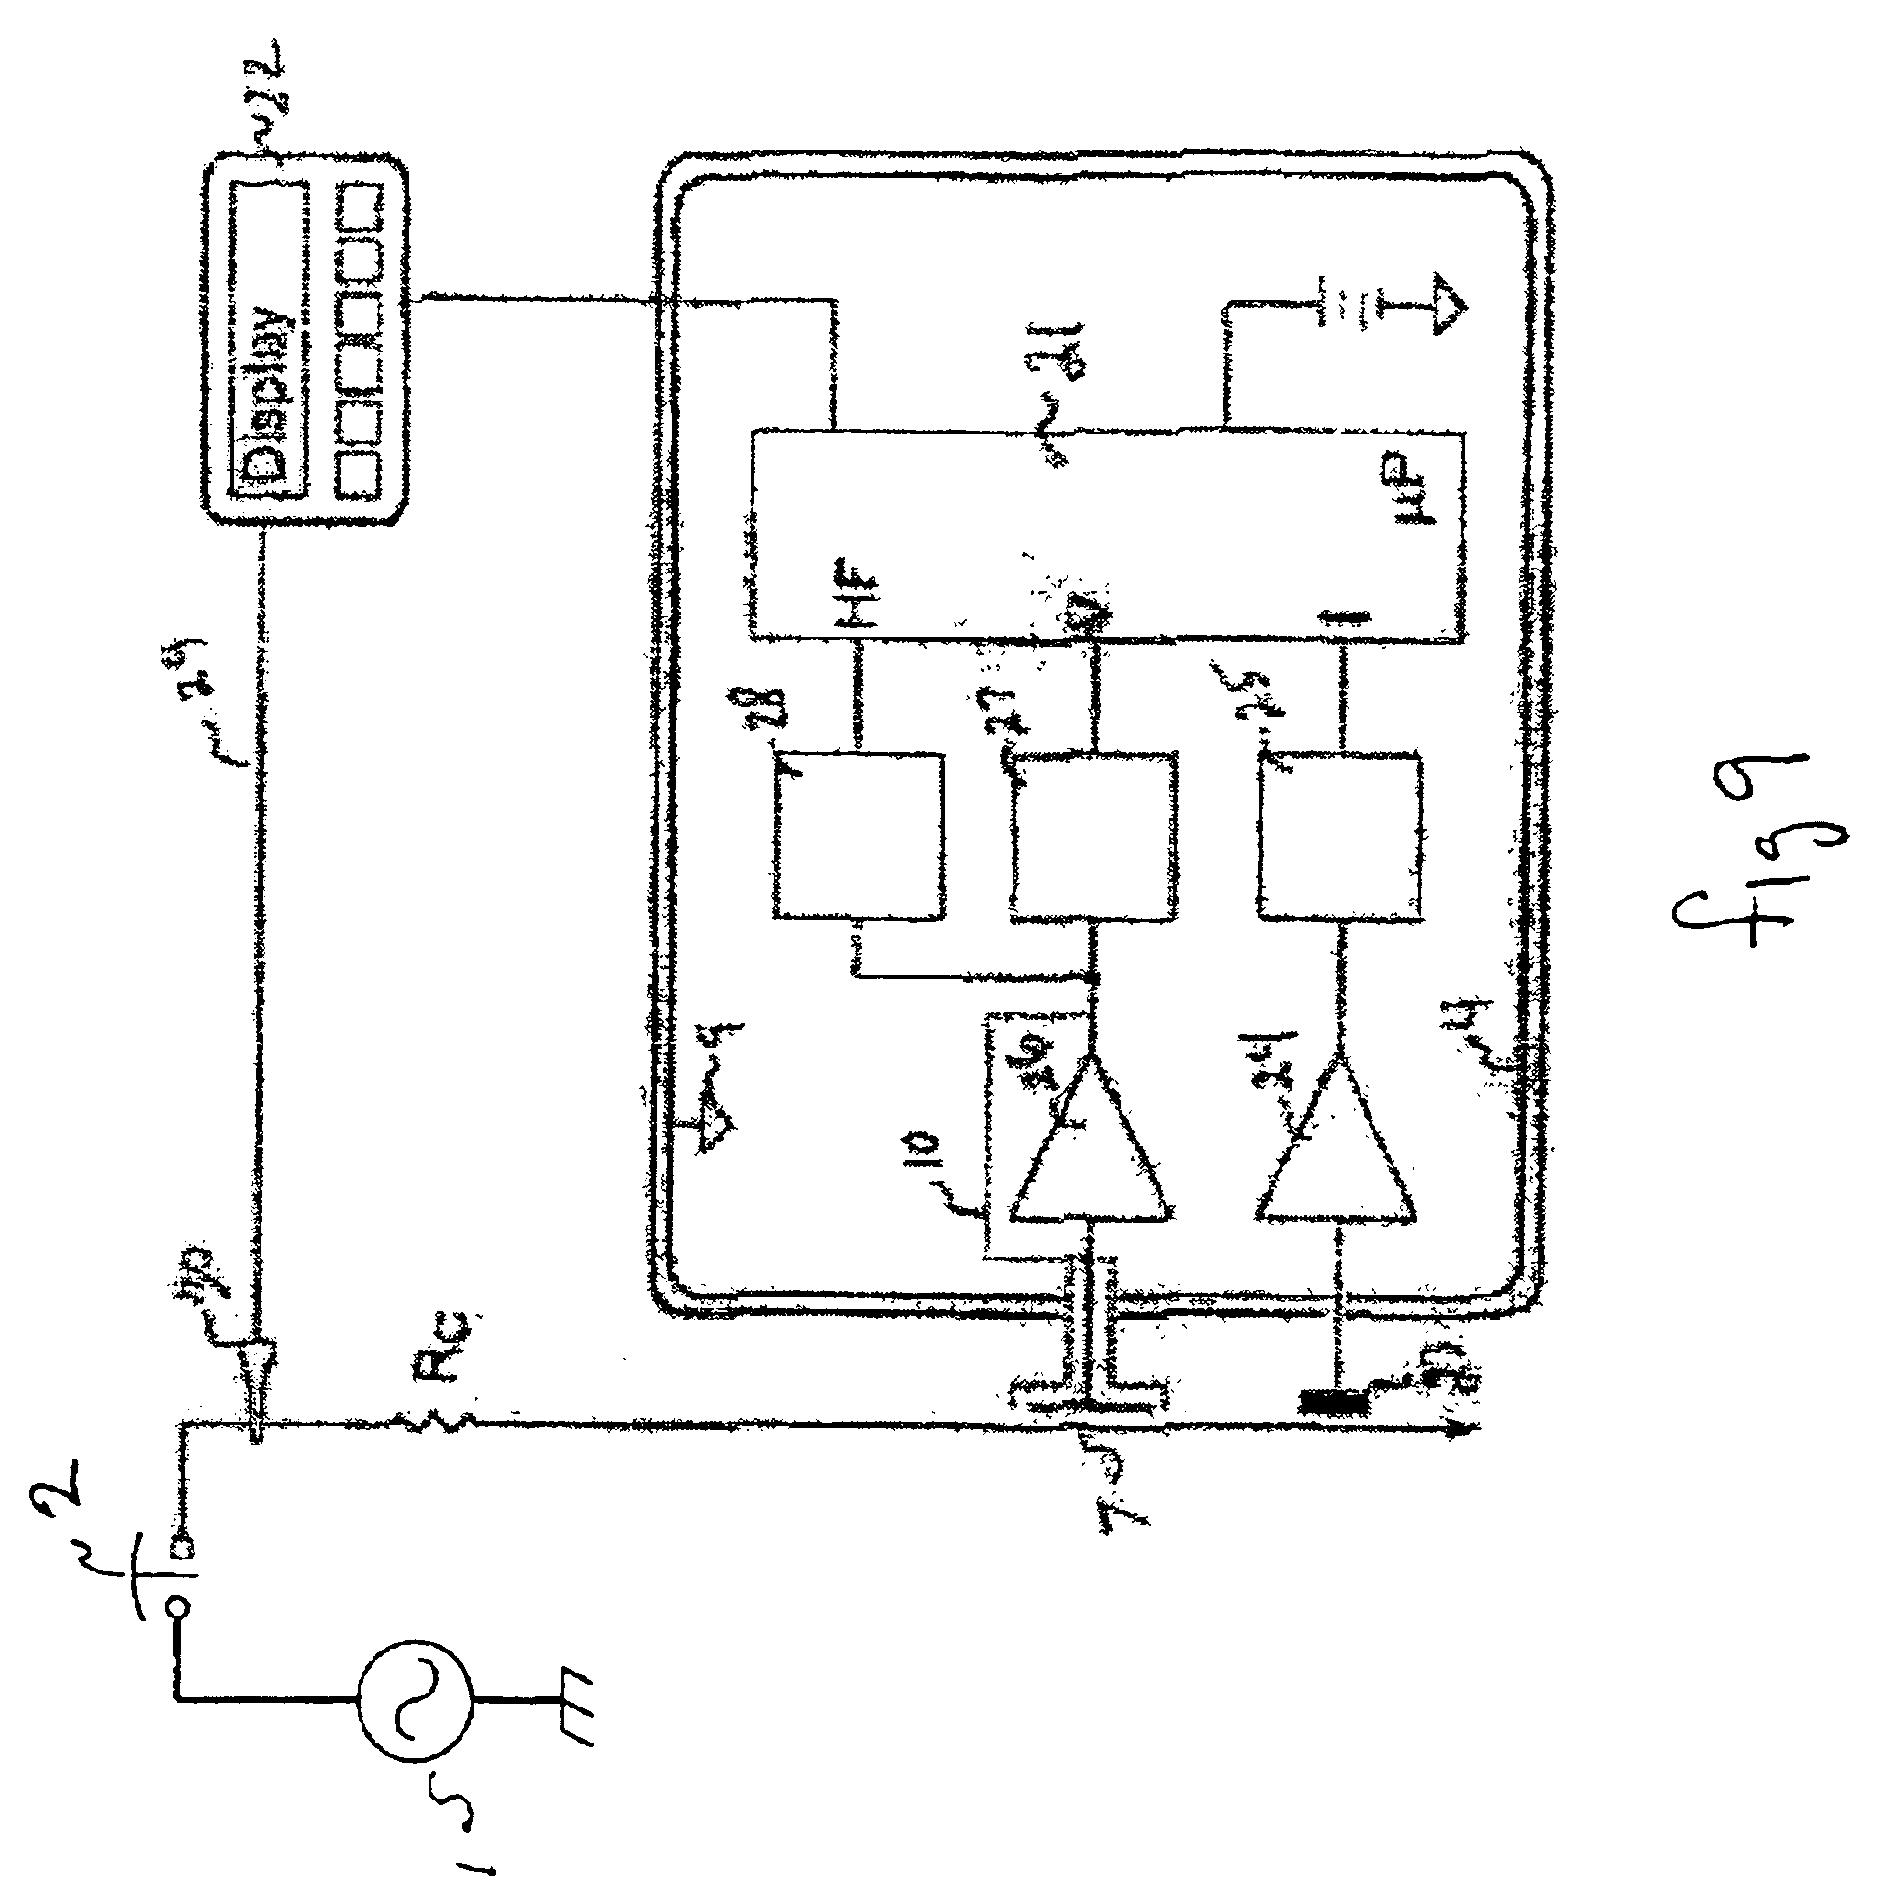 Arc Fault Breaker Wiring Diagram Rj10 Wiring Diagram